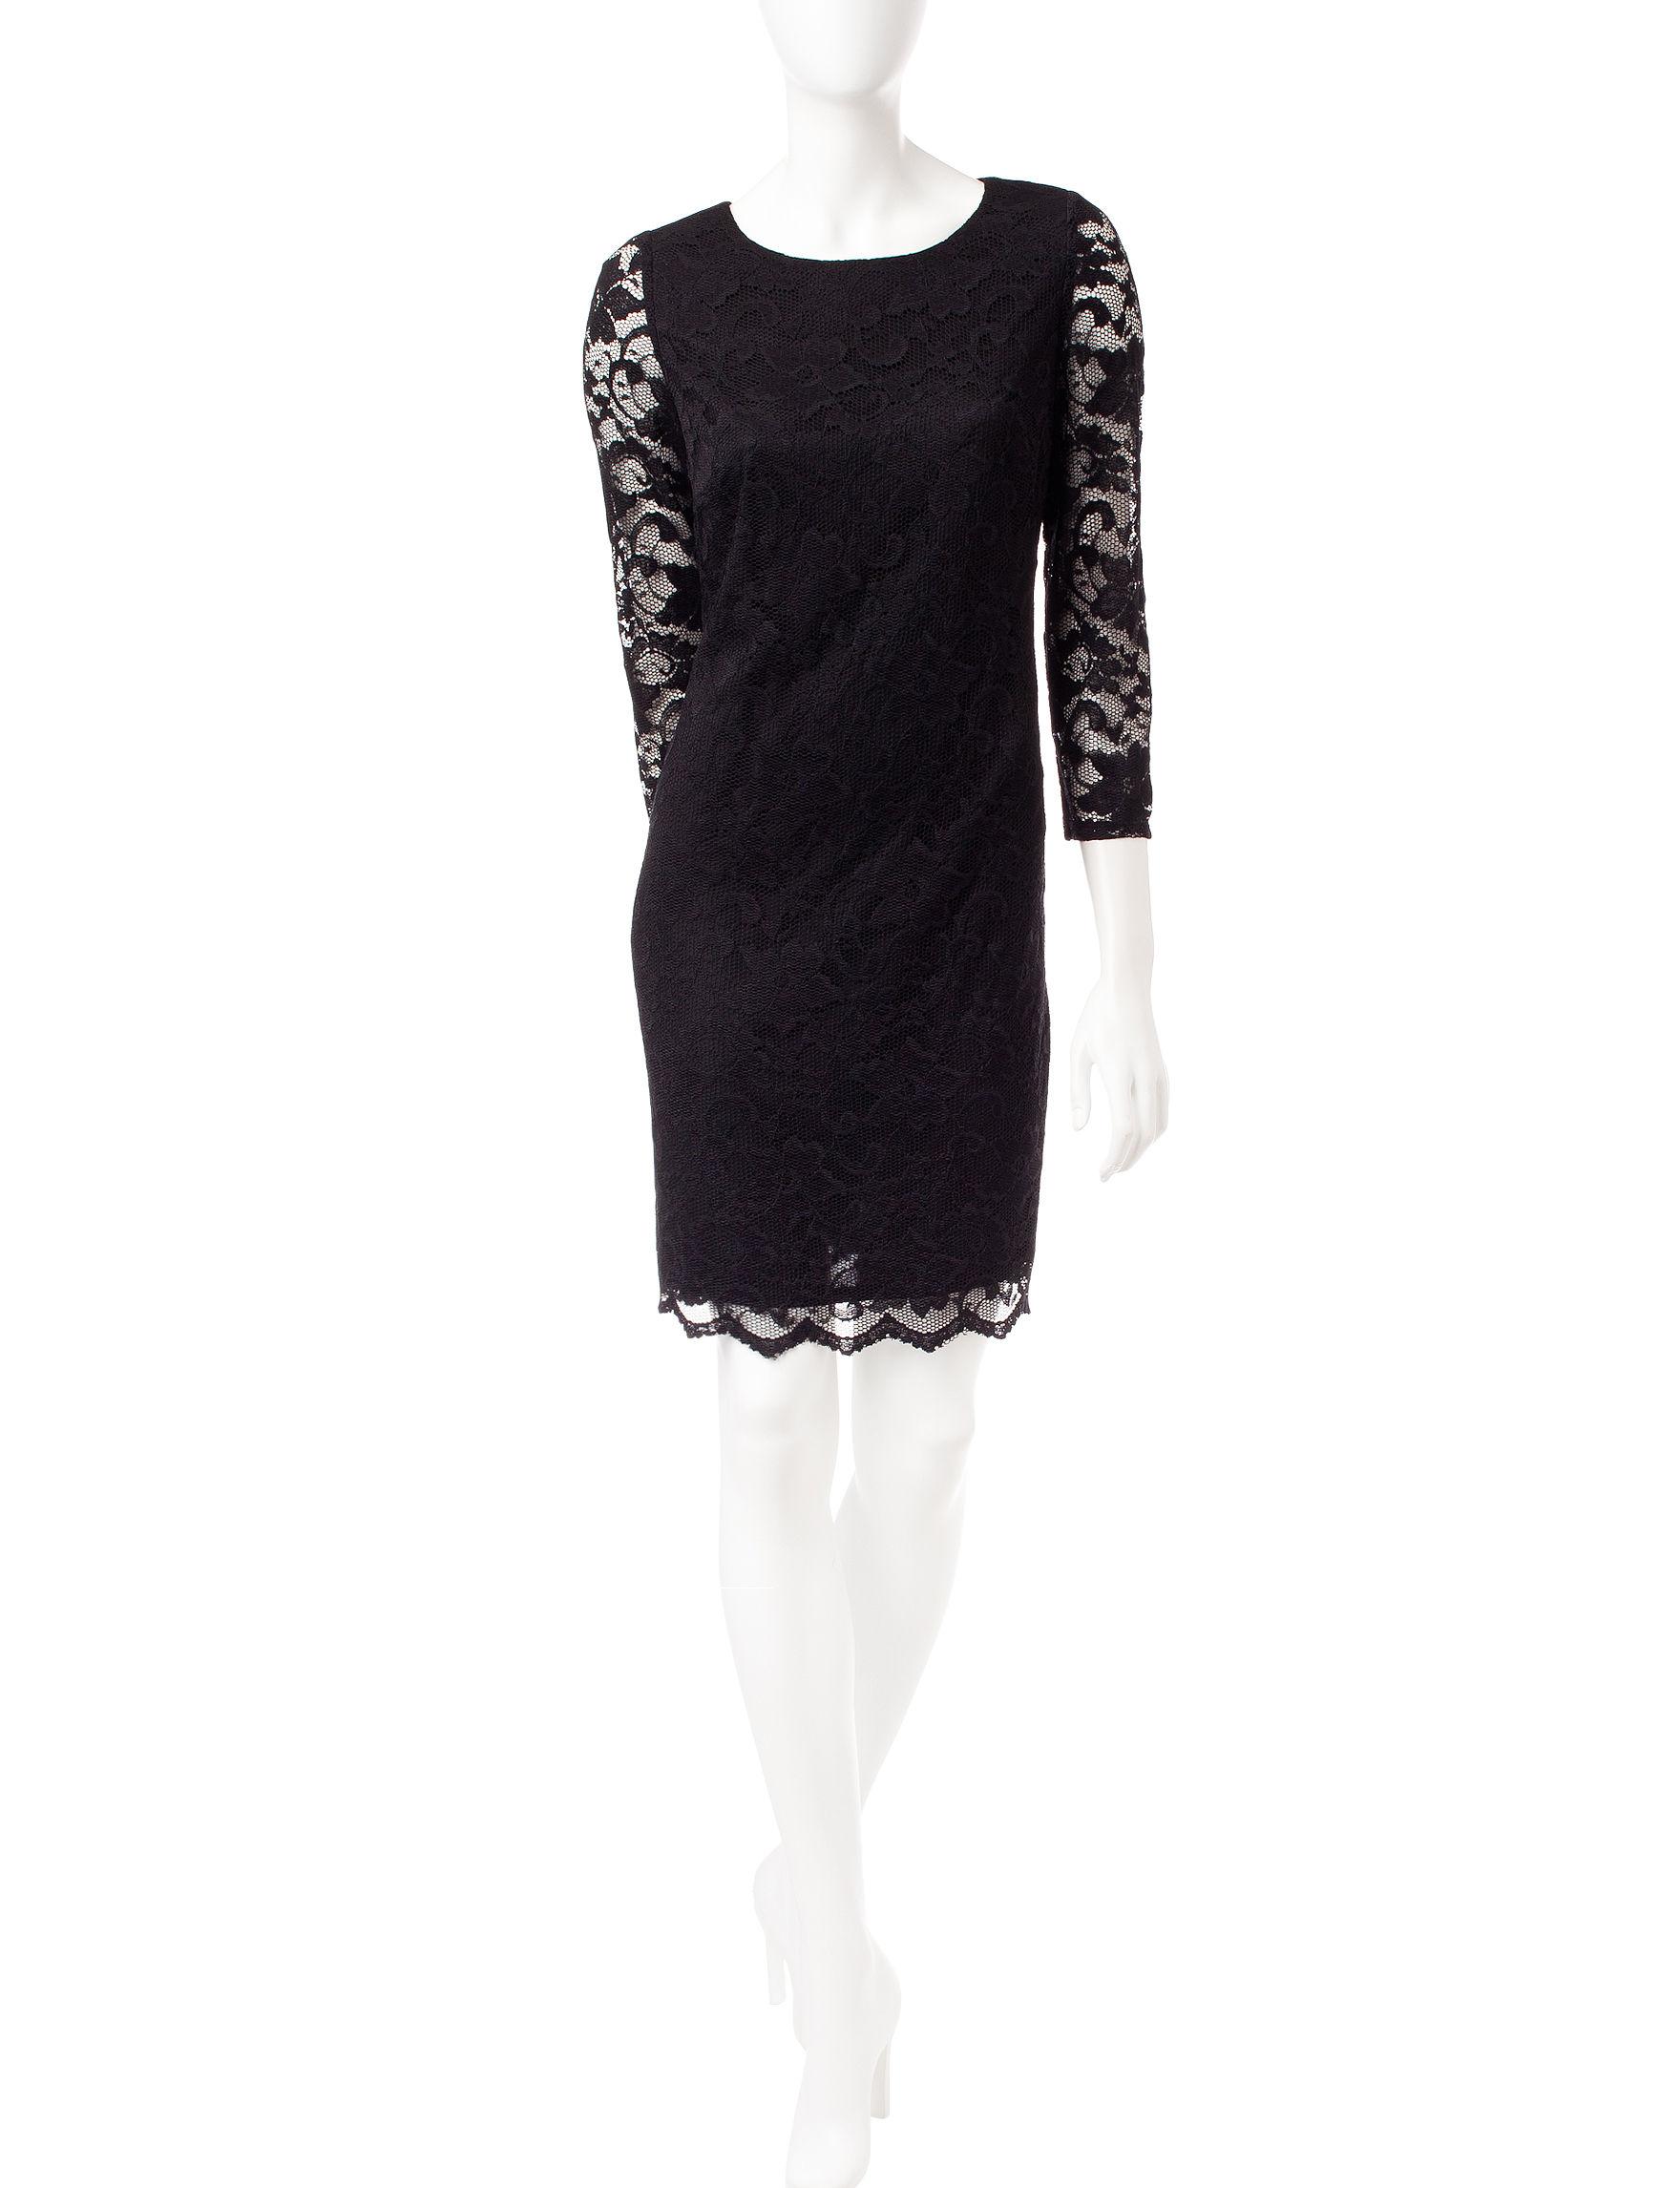 Nine West Black Everyday & Casual Sheath Dresses